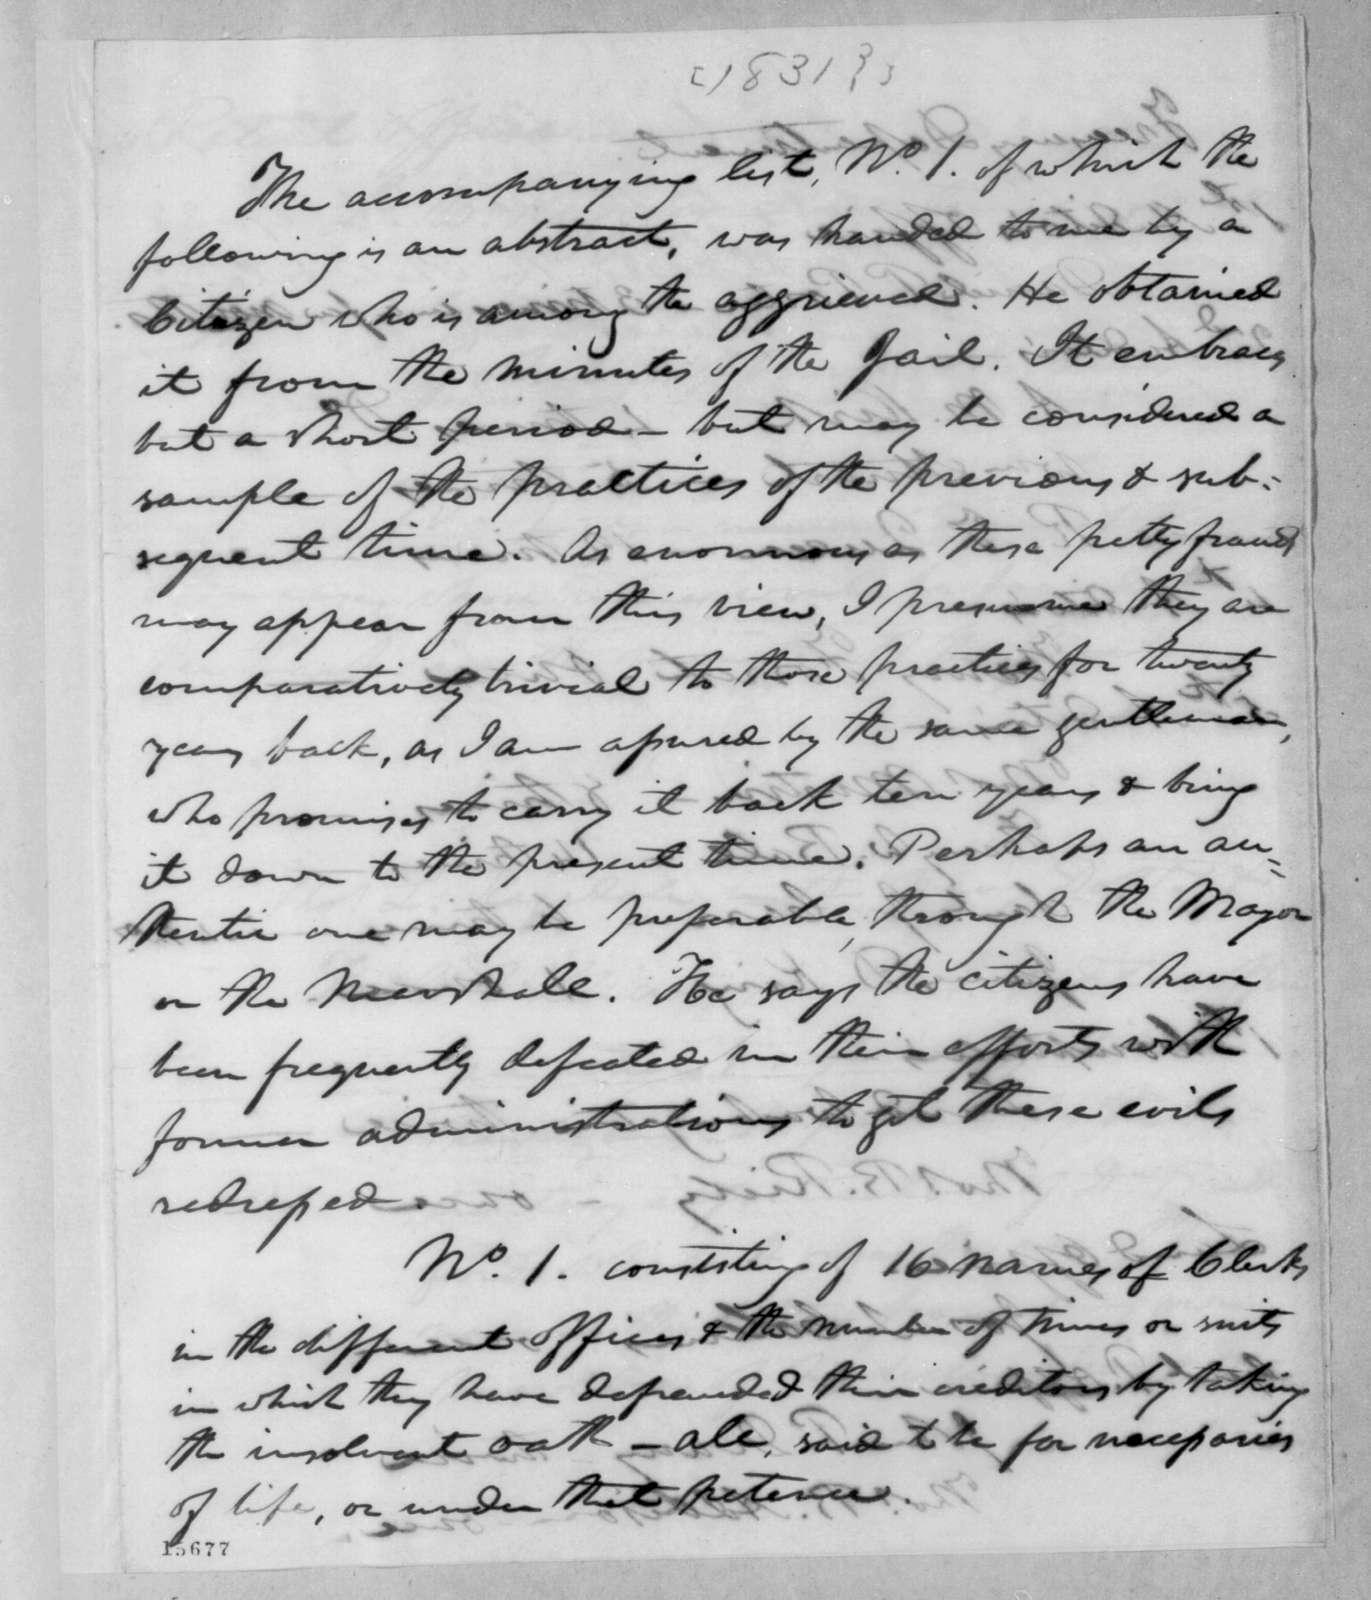 Robert Mayo to Andrew Jackson, March 6, 1831